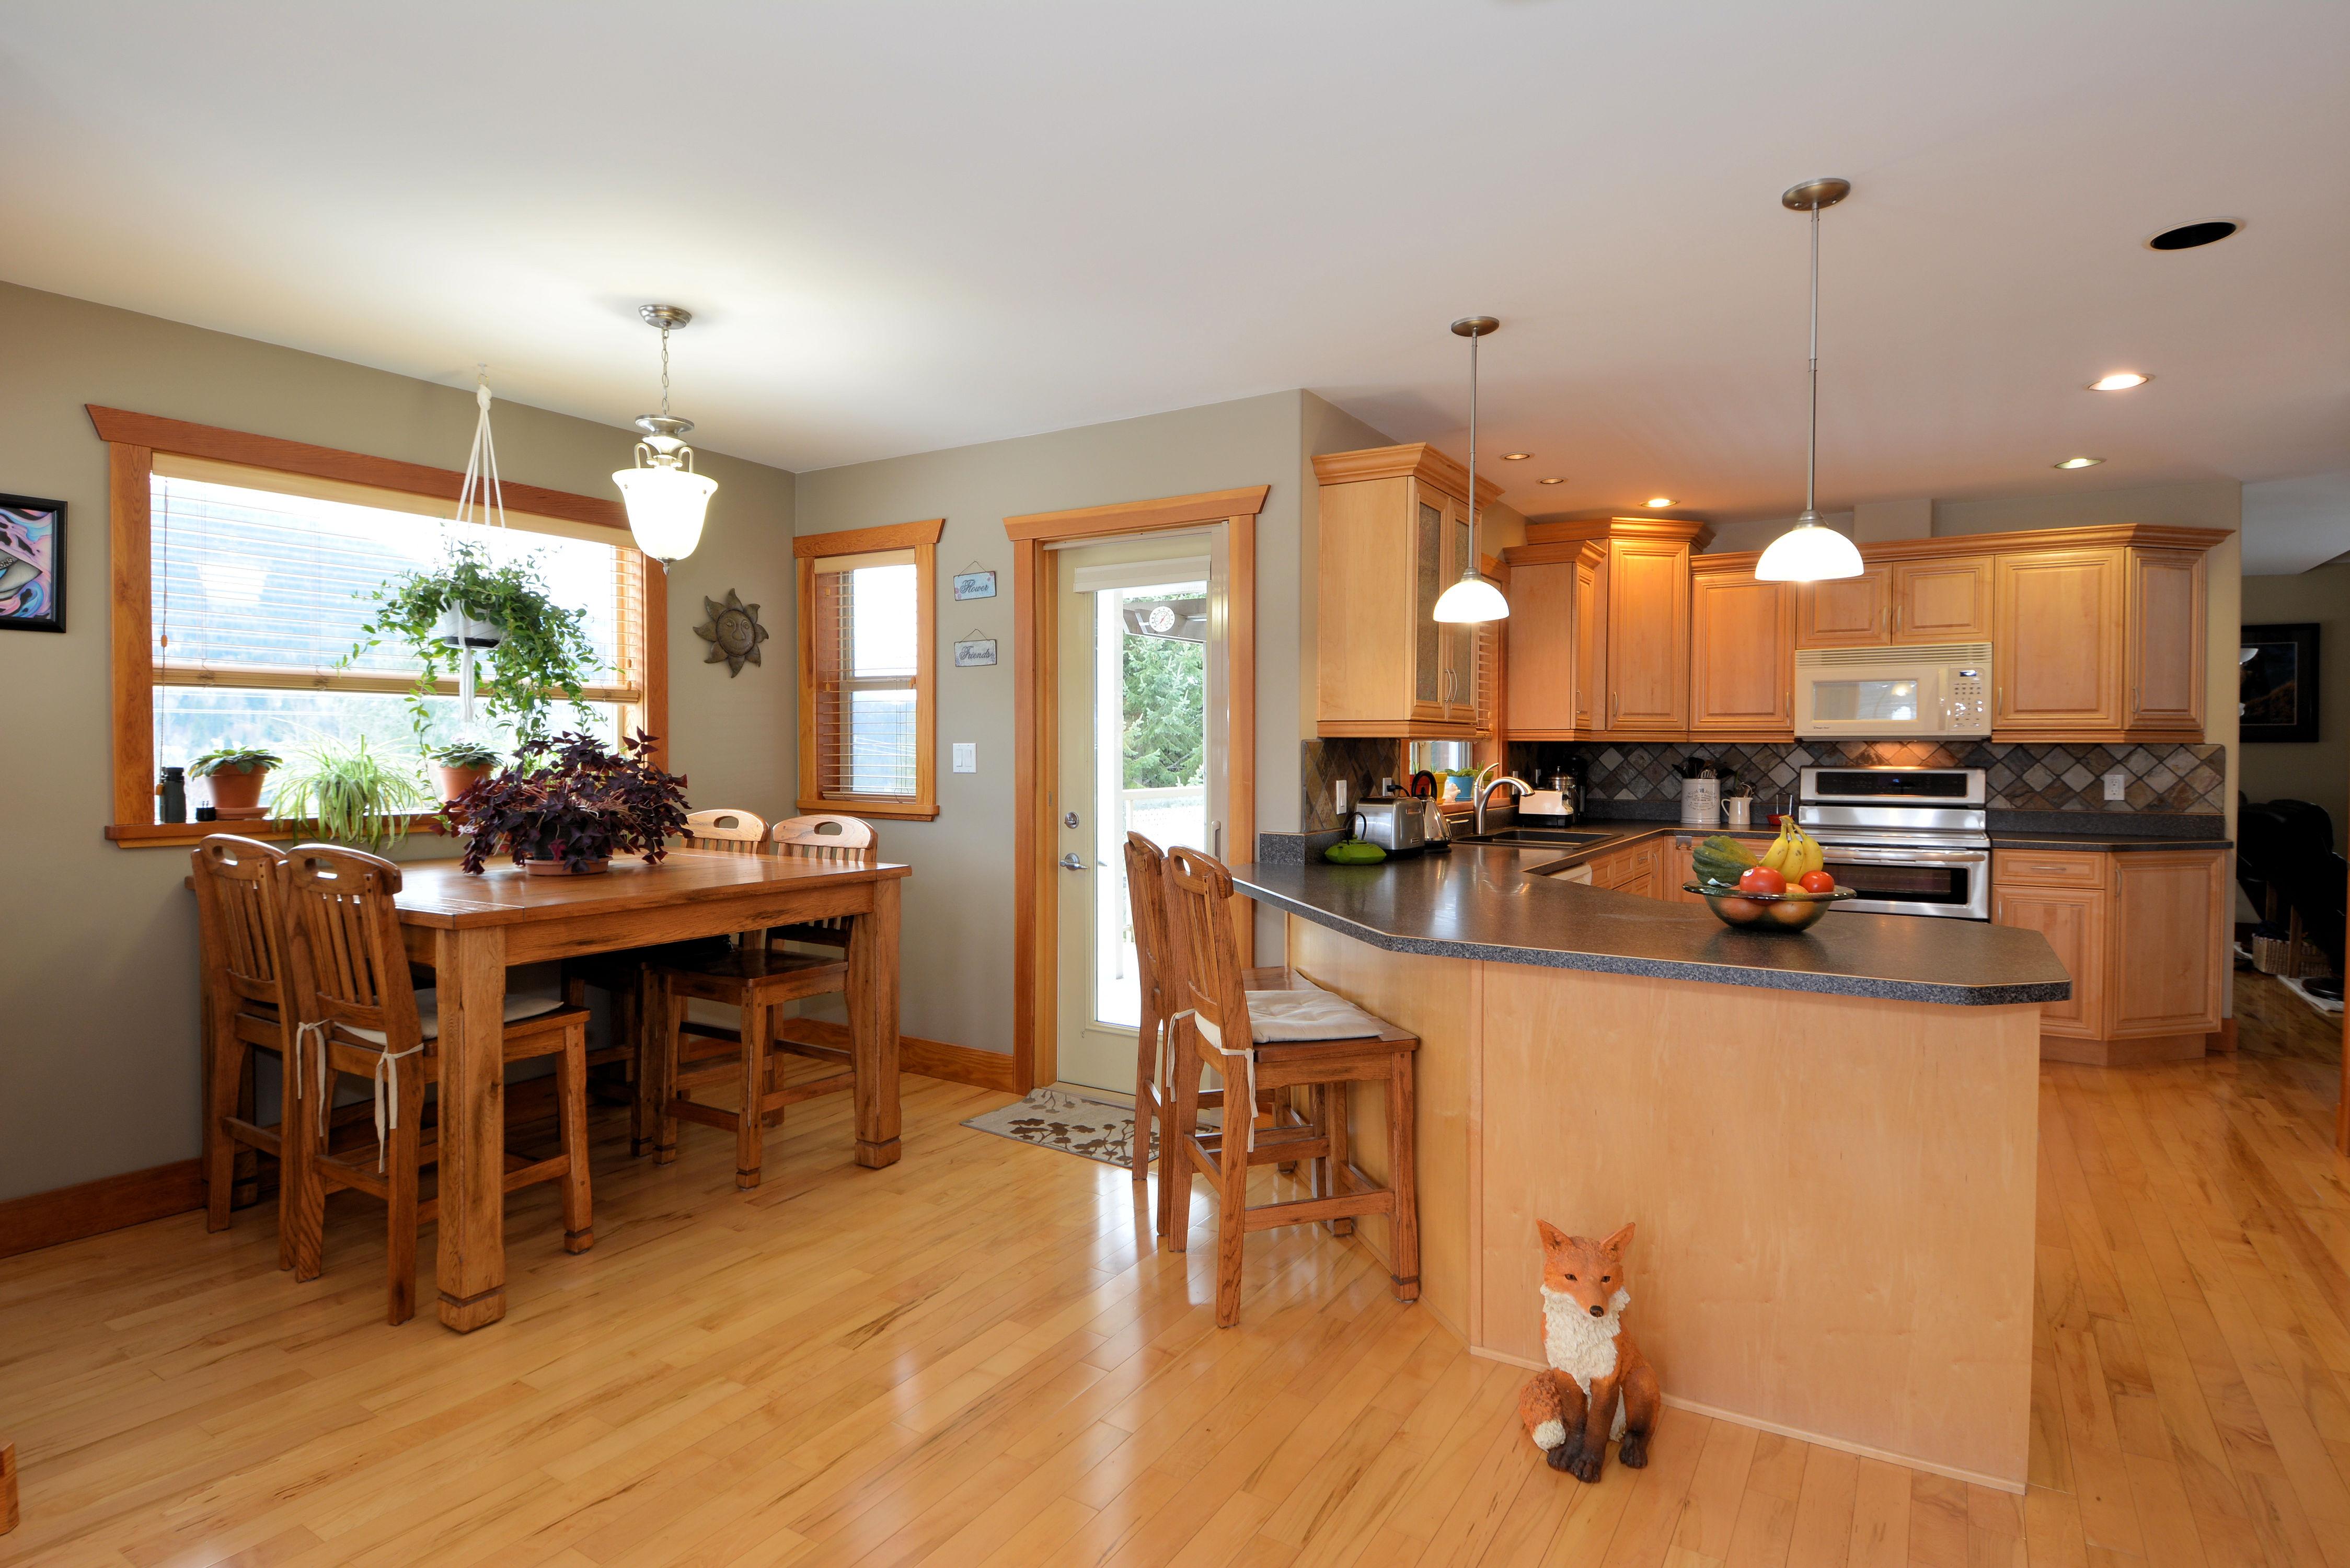 Kitchen / Eating Nook